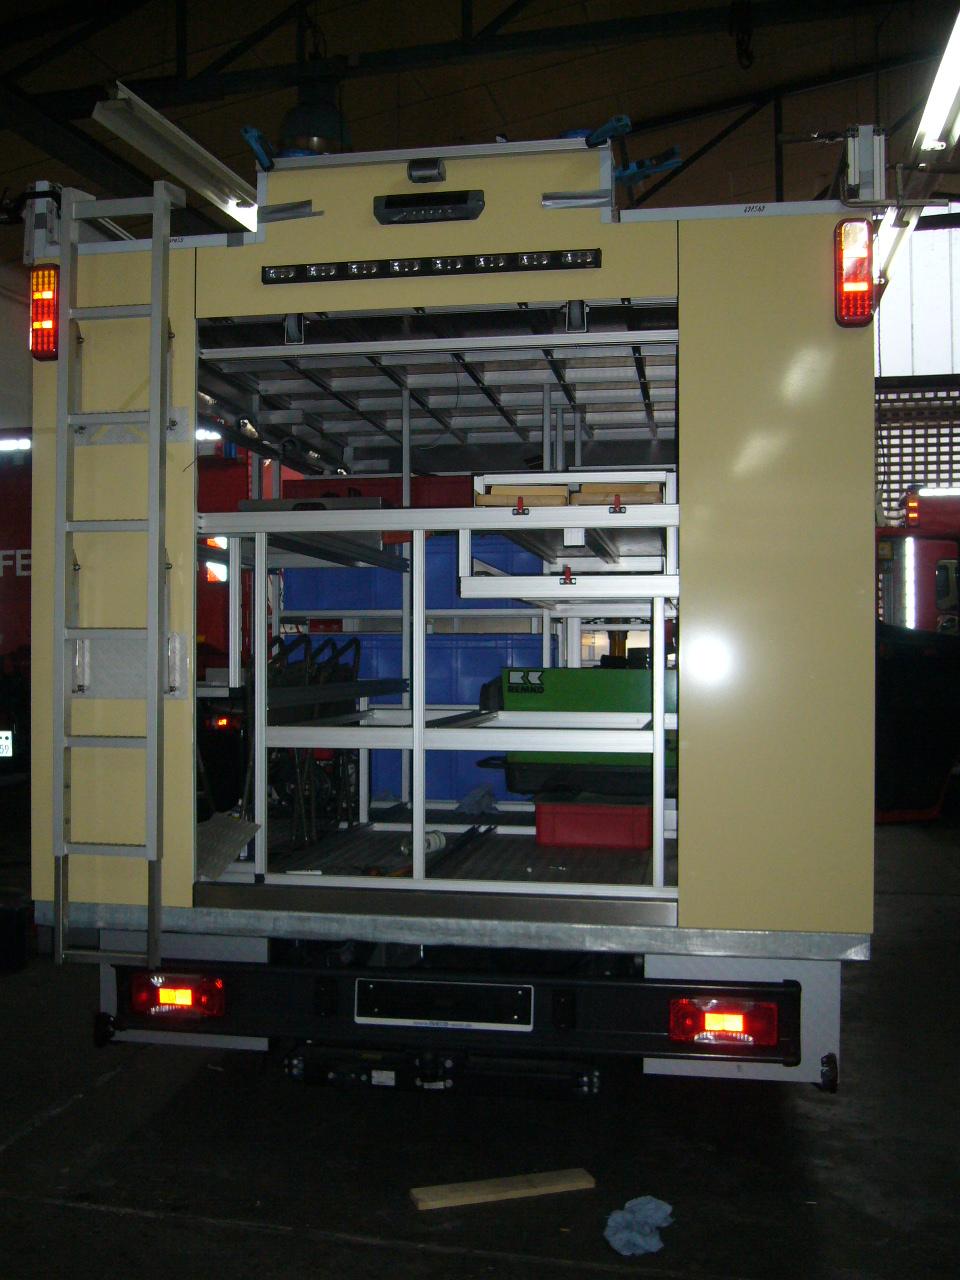 P1040603.JPG